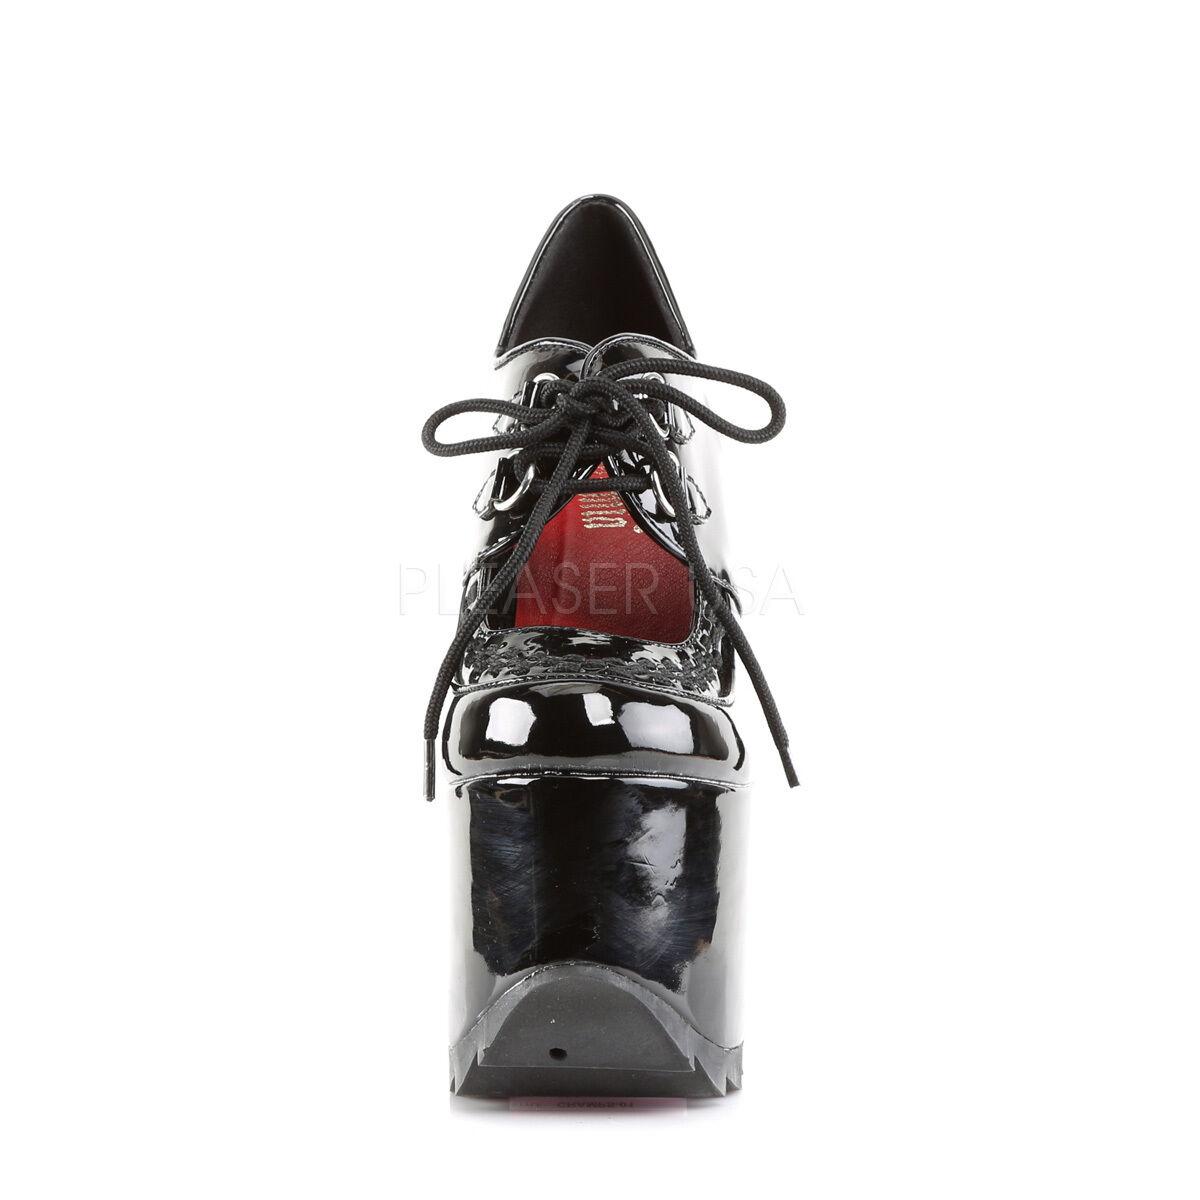 Demonia Block Cramps-01 Ladies Black Patent Lace Up Ridged Platform Block Demonia Heel Shoes a5a5a7